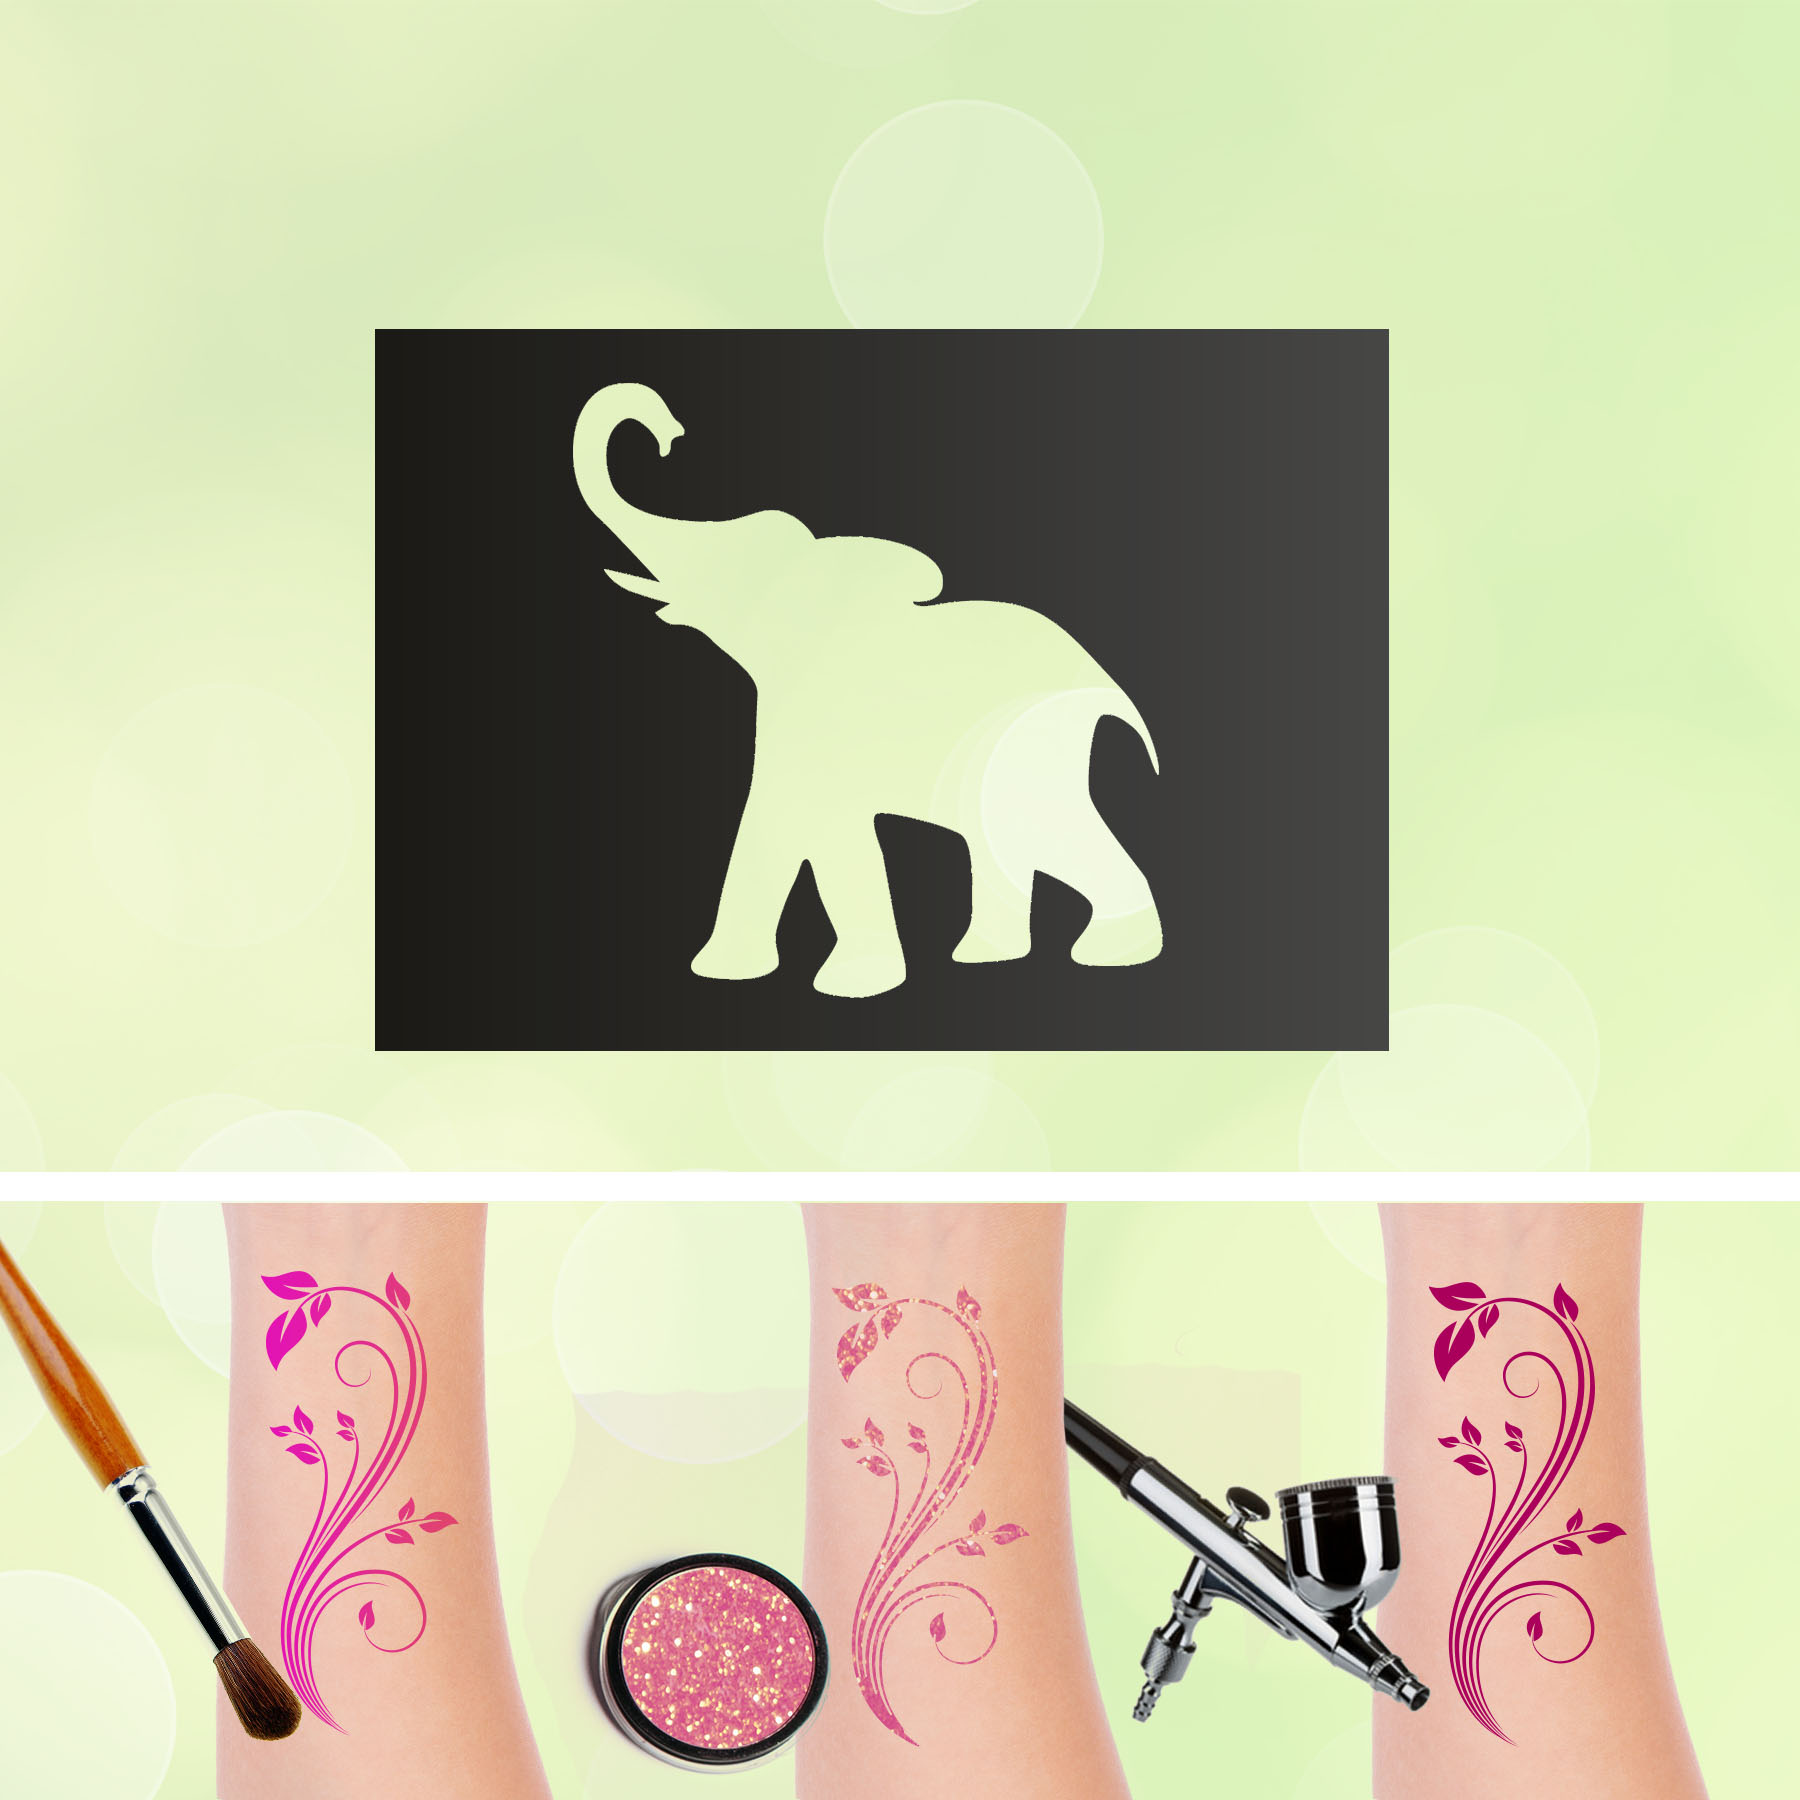 Tattoo Schablonen Elefant Selbstklebend Kinderschminken Airbrush